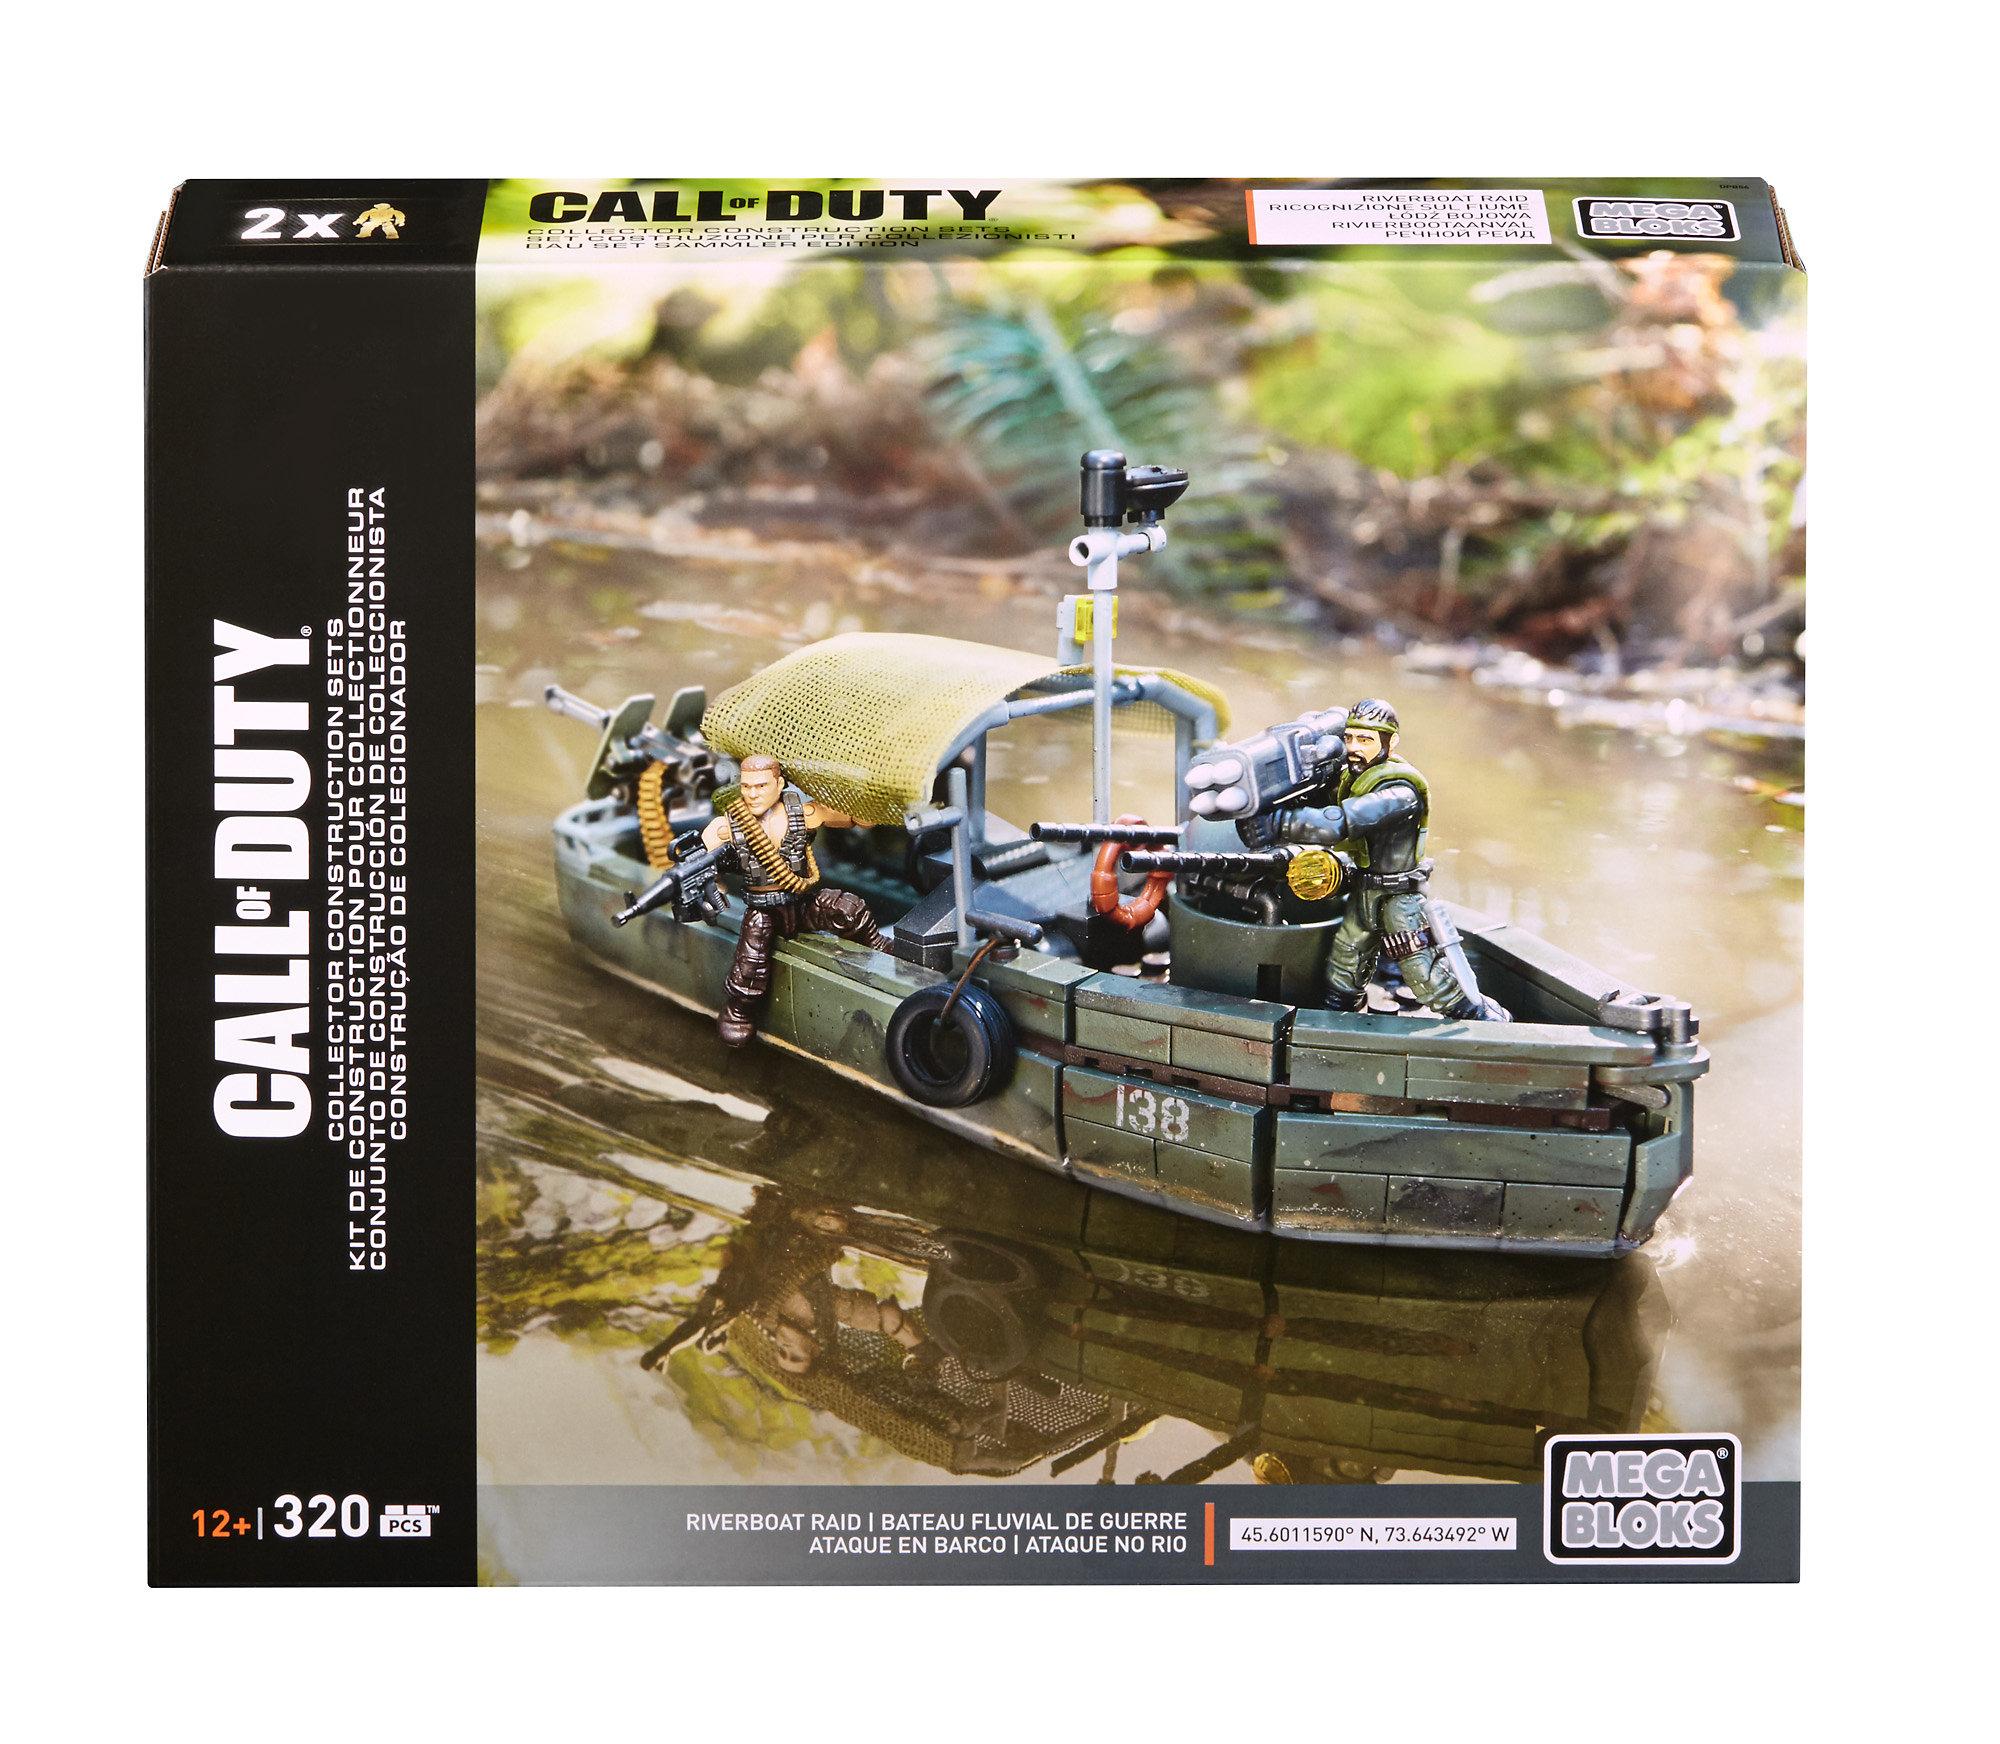 Mega Bloks Call of Duty Riverboat Raid Collector Construction Set by Mattel